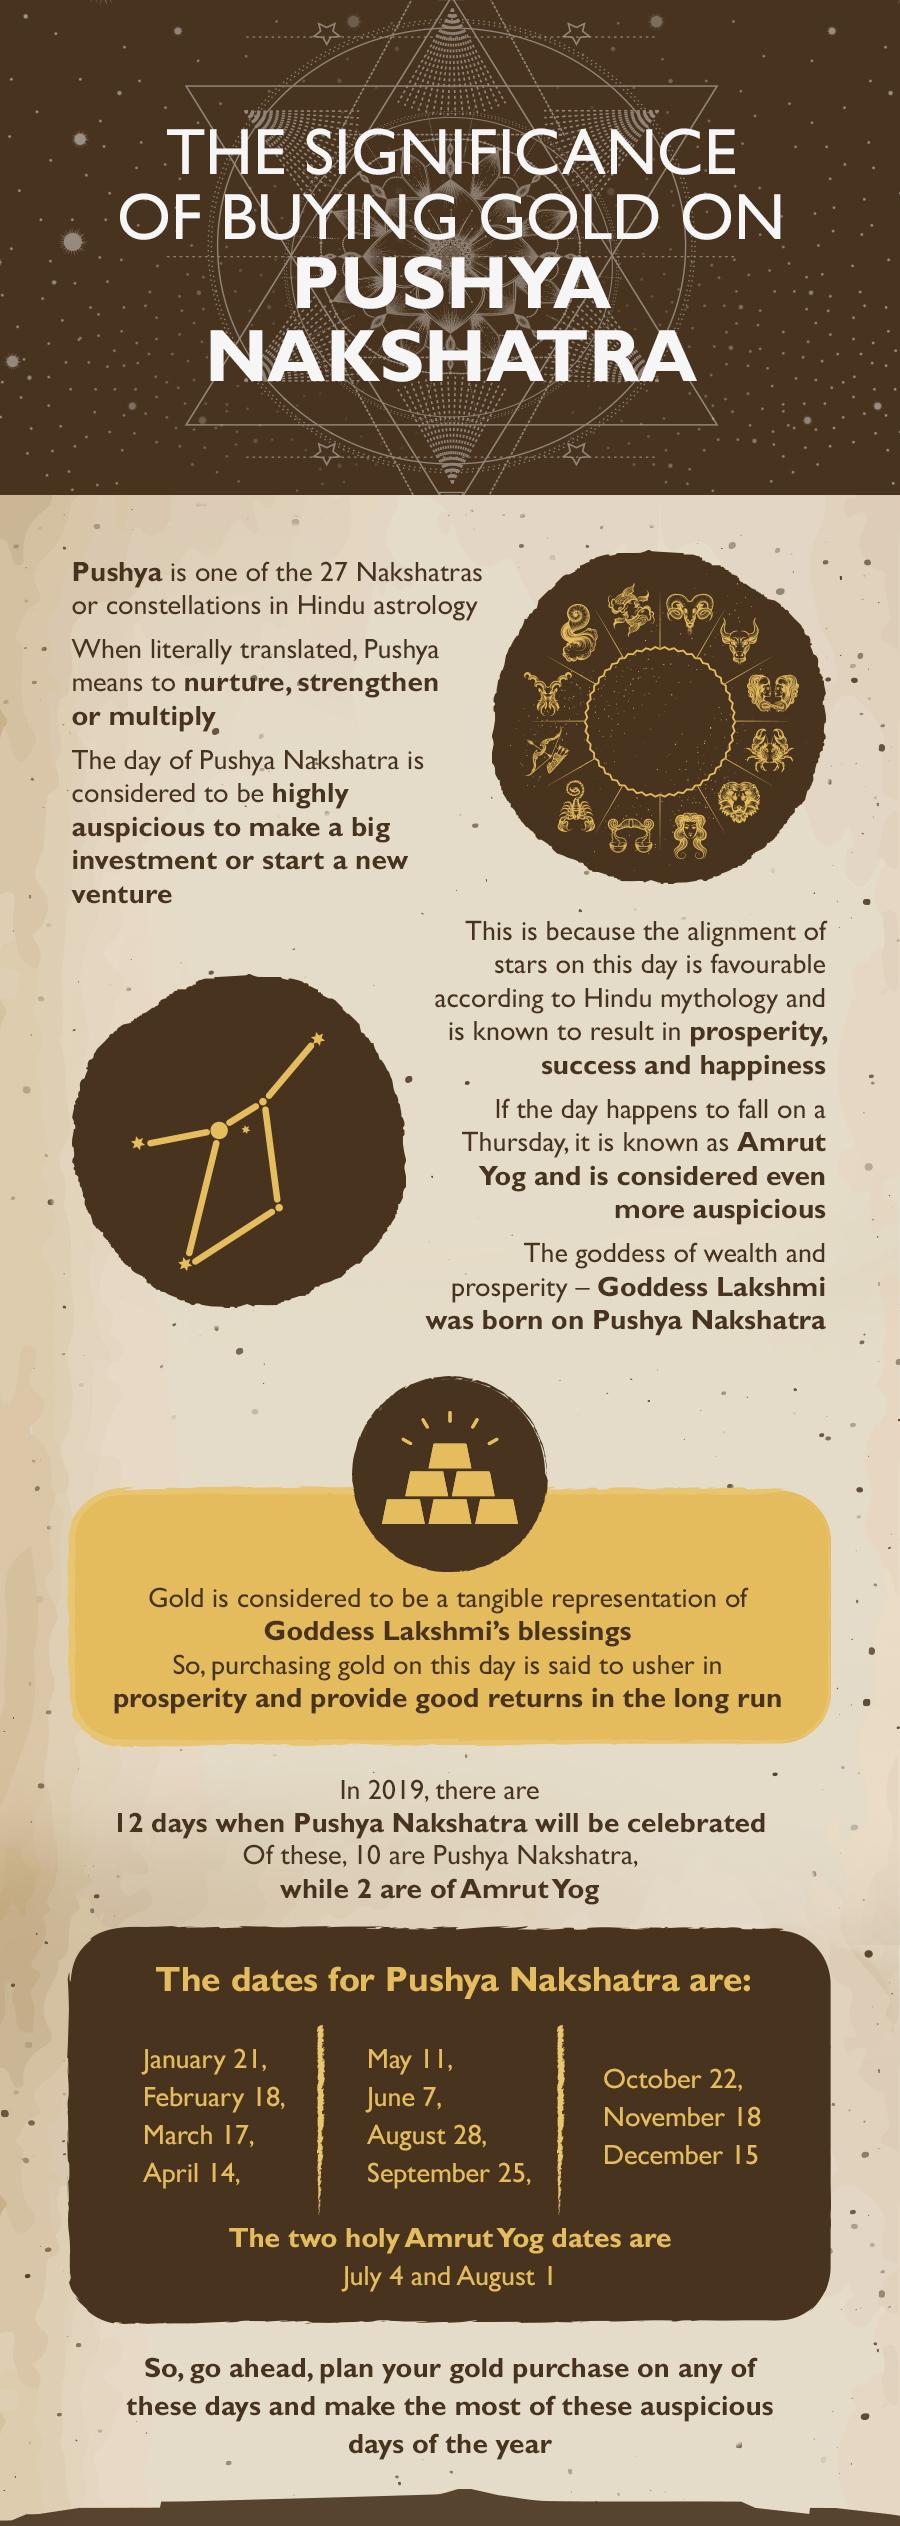 Dates of Pushya Nakshatra and Importance of buying gold on this day